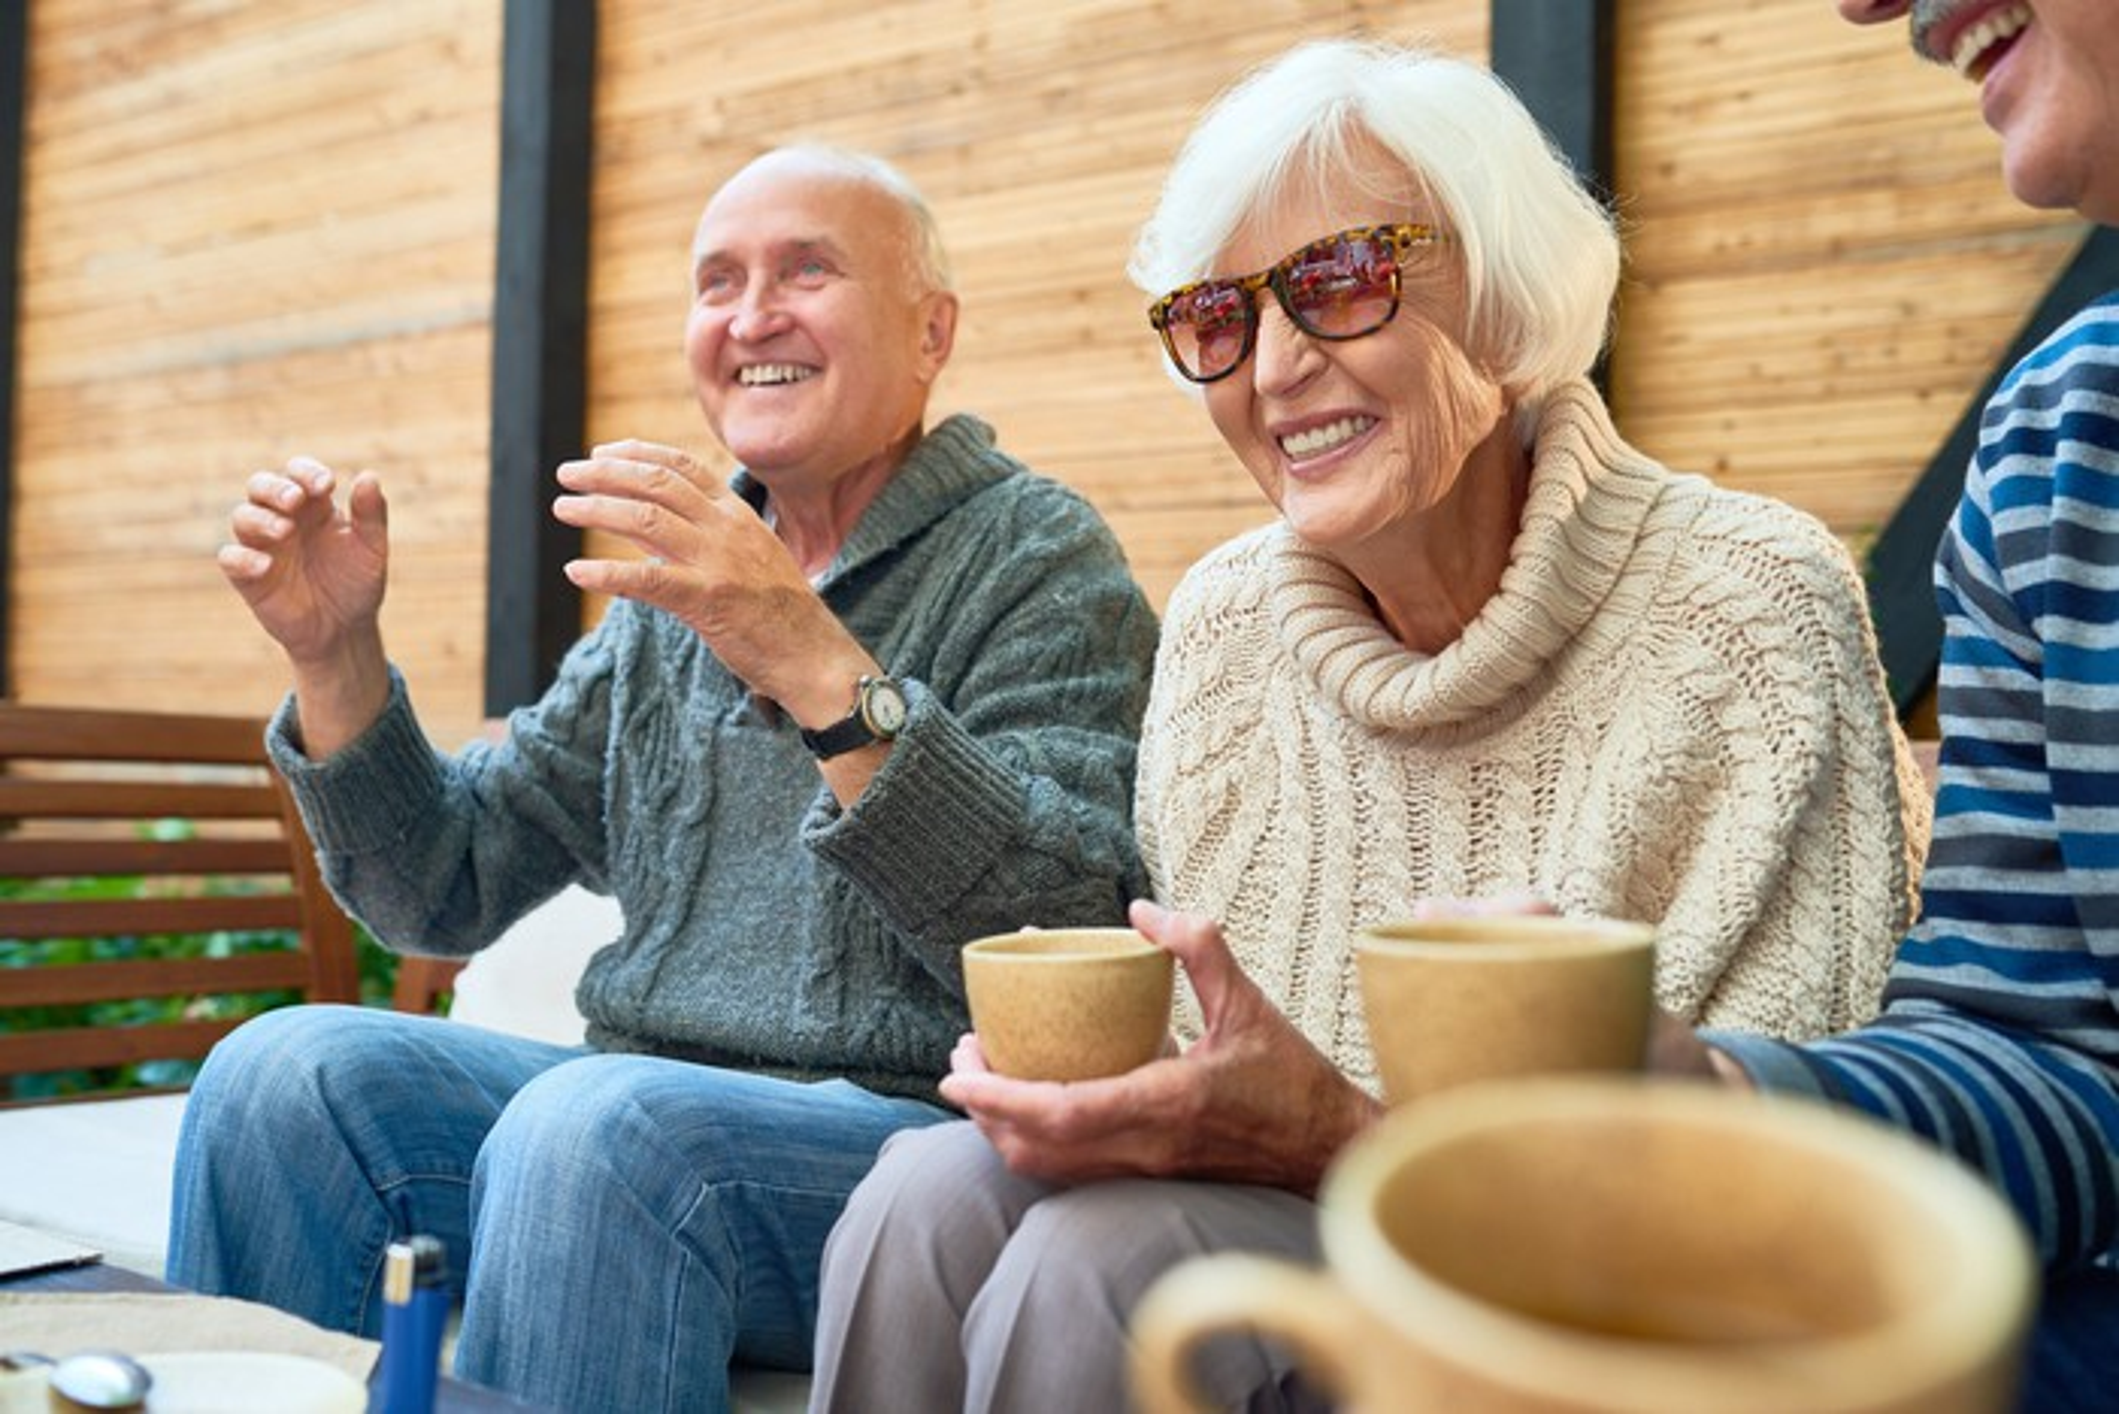 Smiling older woman in sunglasses sitting between two men.